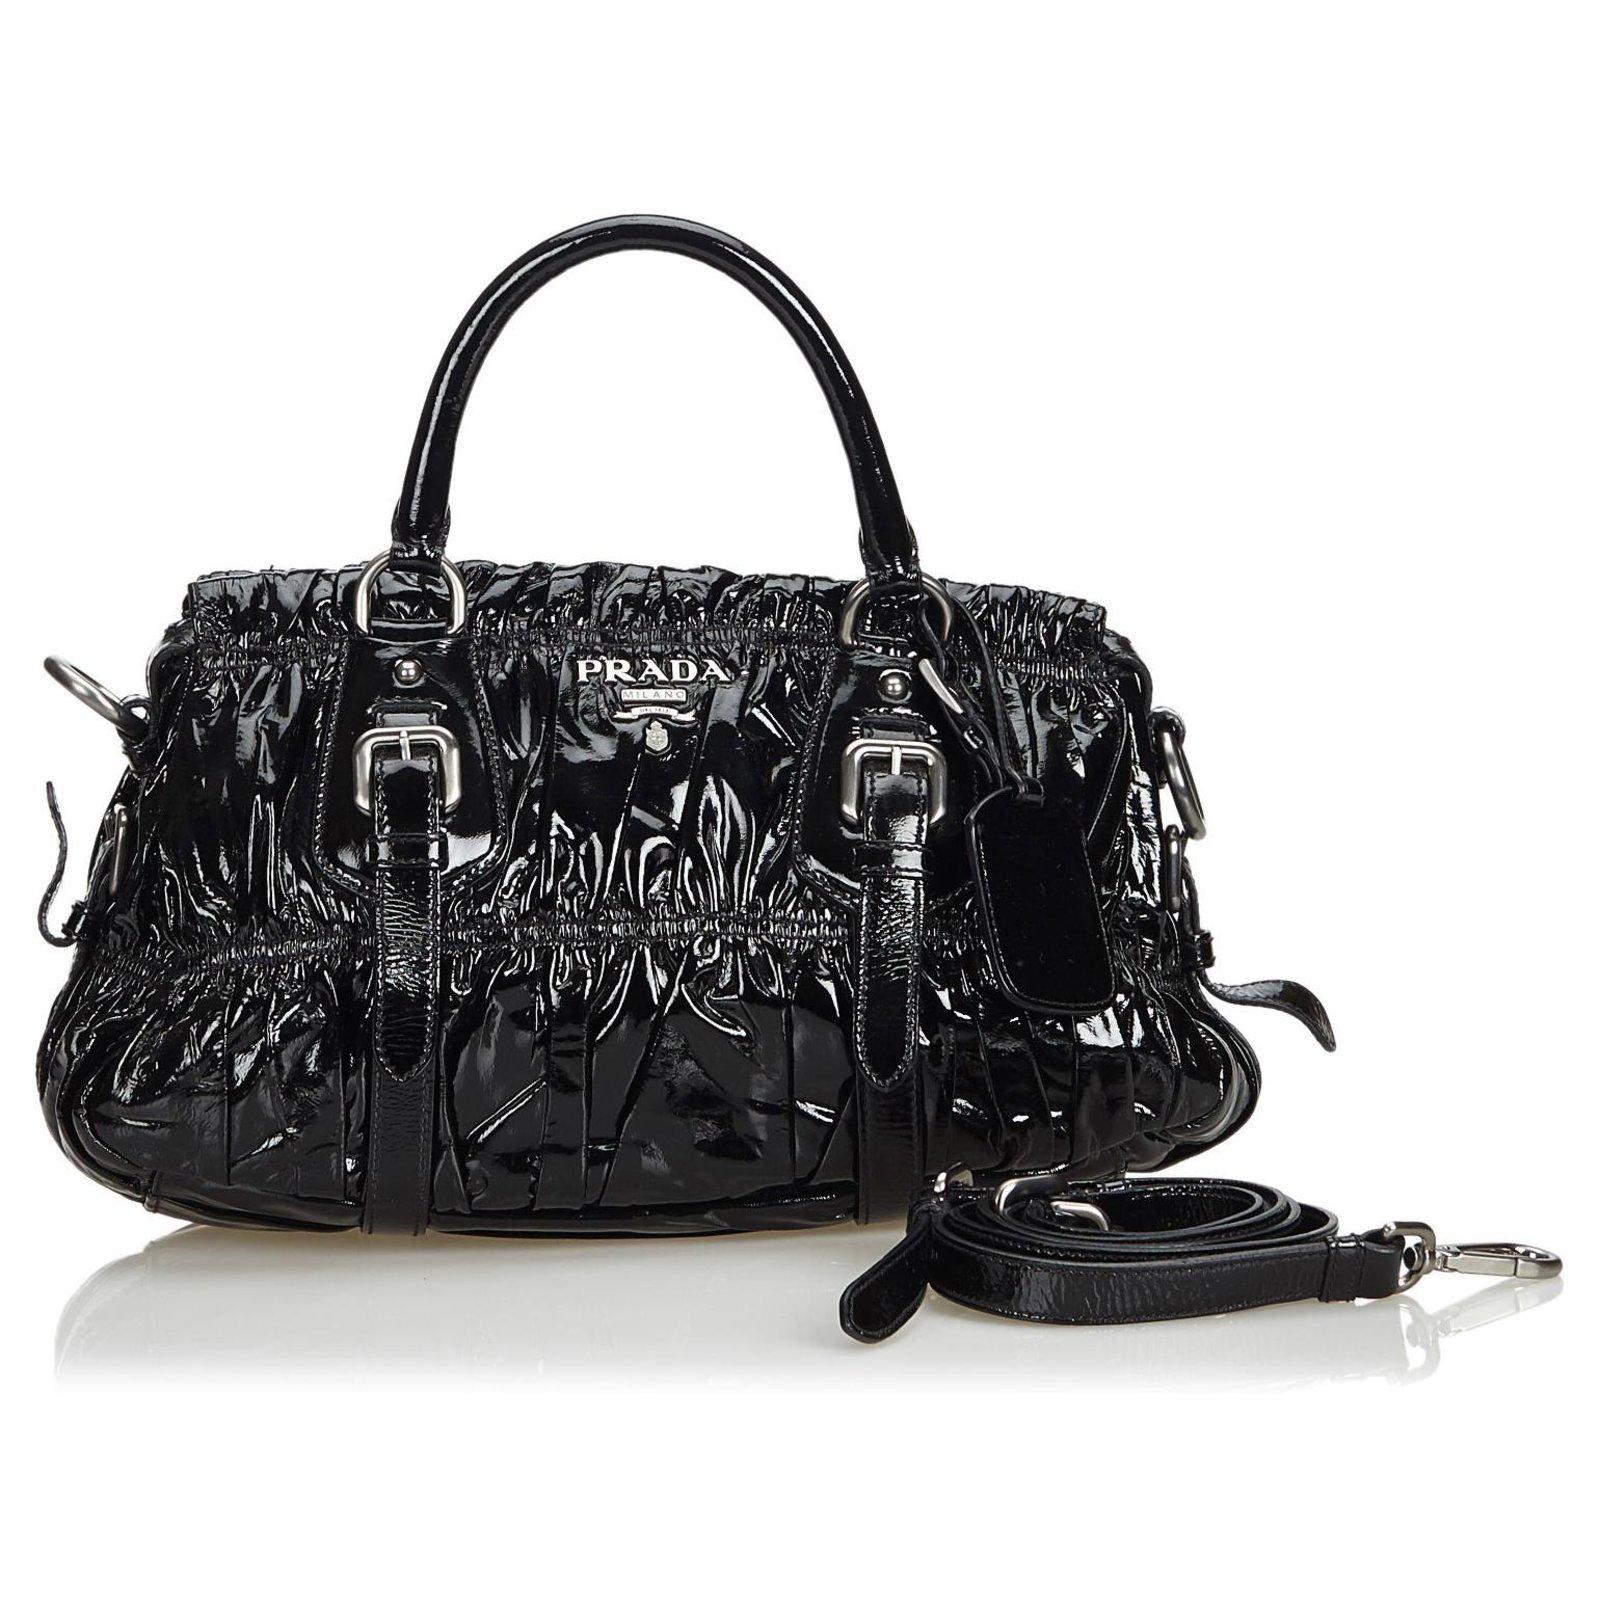 bf6cc0440a2a Prada Prada Black Gathered Patent Leather Satchel Handbags Leather,Patent  leather Black ref.119489